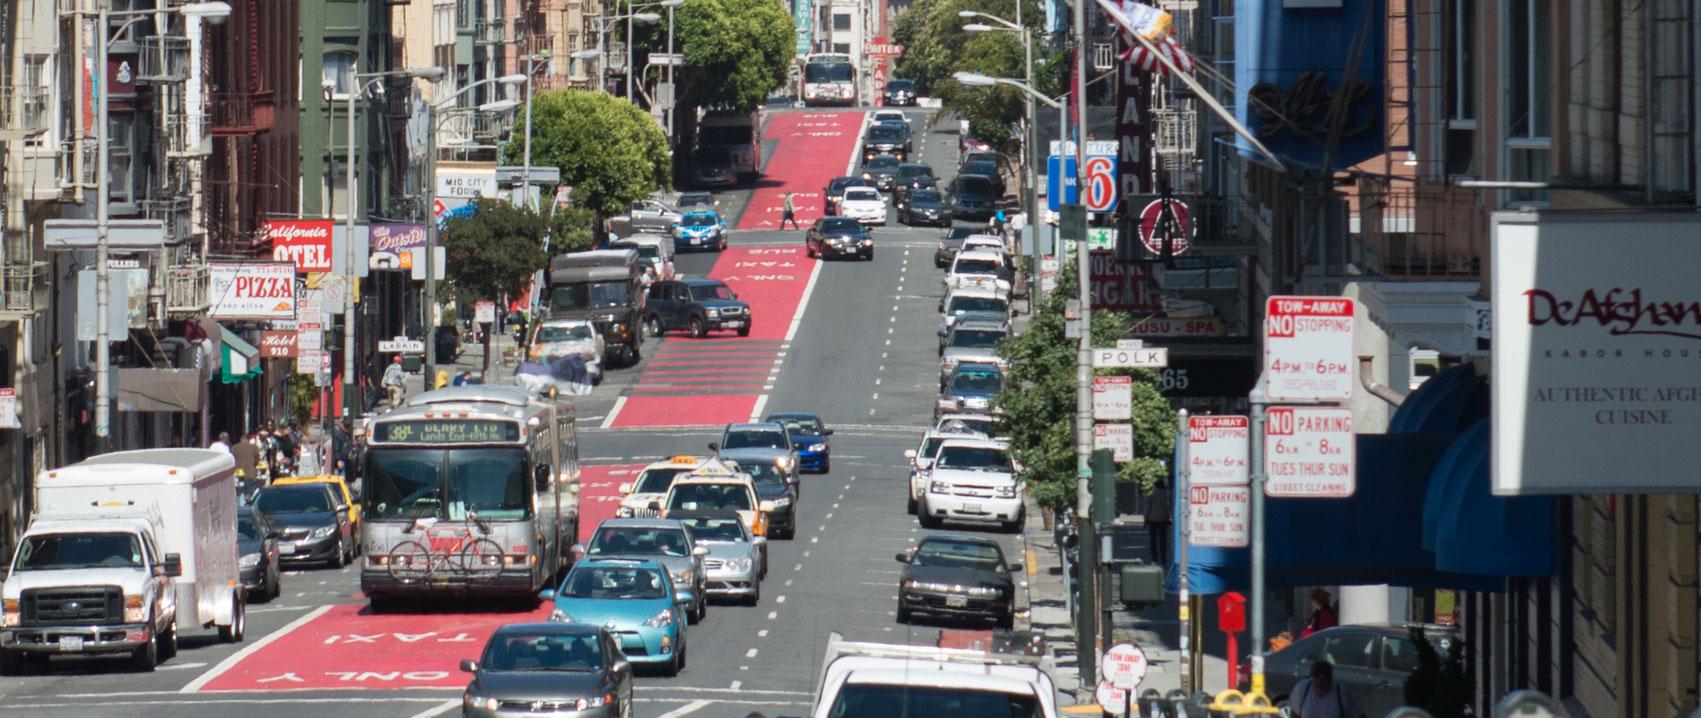 NACTO-Curb-Appeal-Curbside-Management-CROP3.jpg